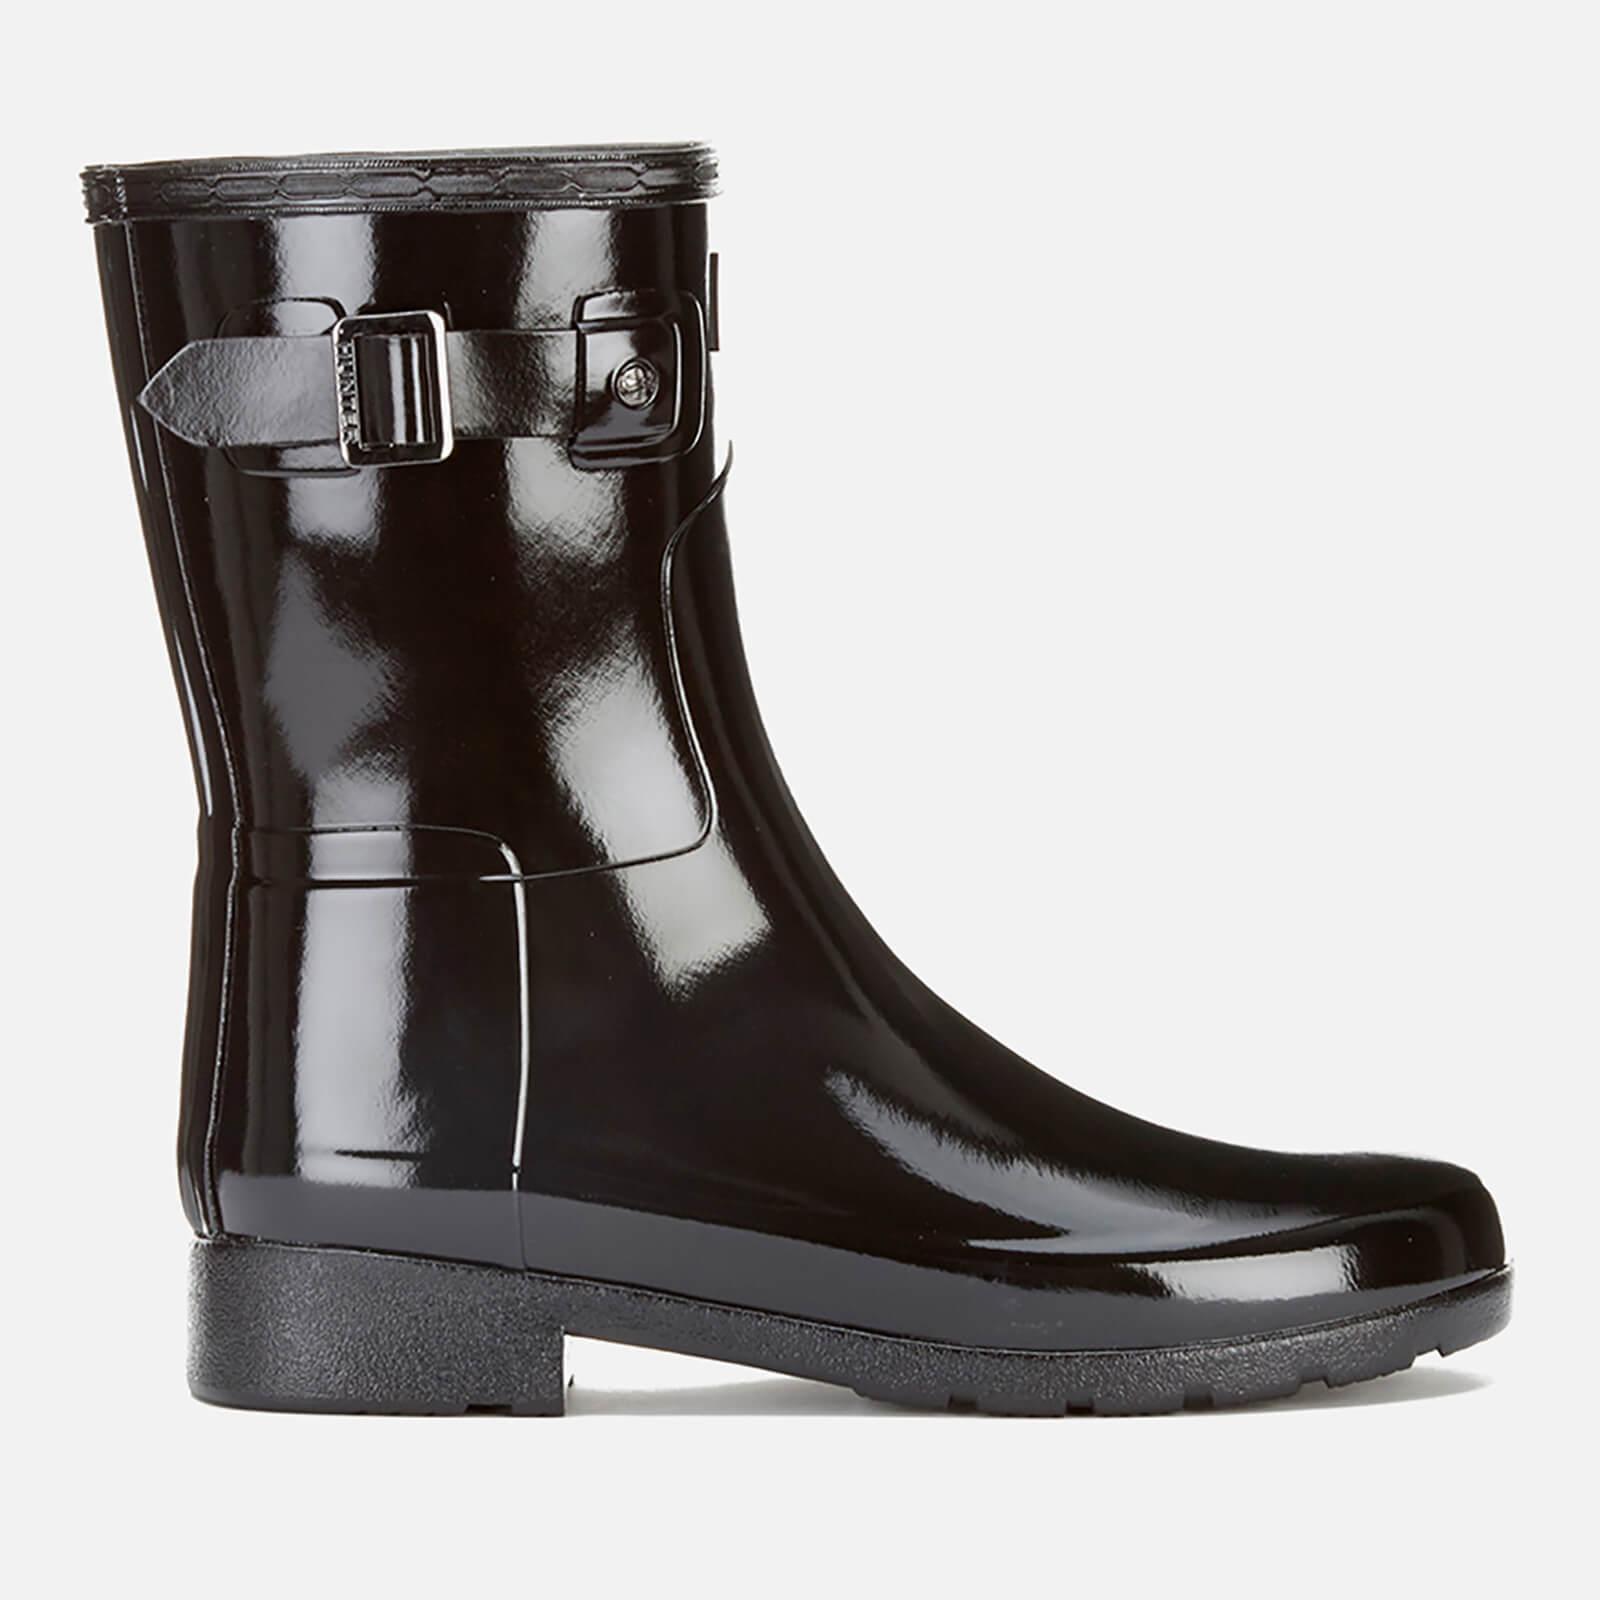 0a6cd28f138 Women's Designer Wellies | Festival-Ready Wellington Boots | AllSole